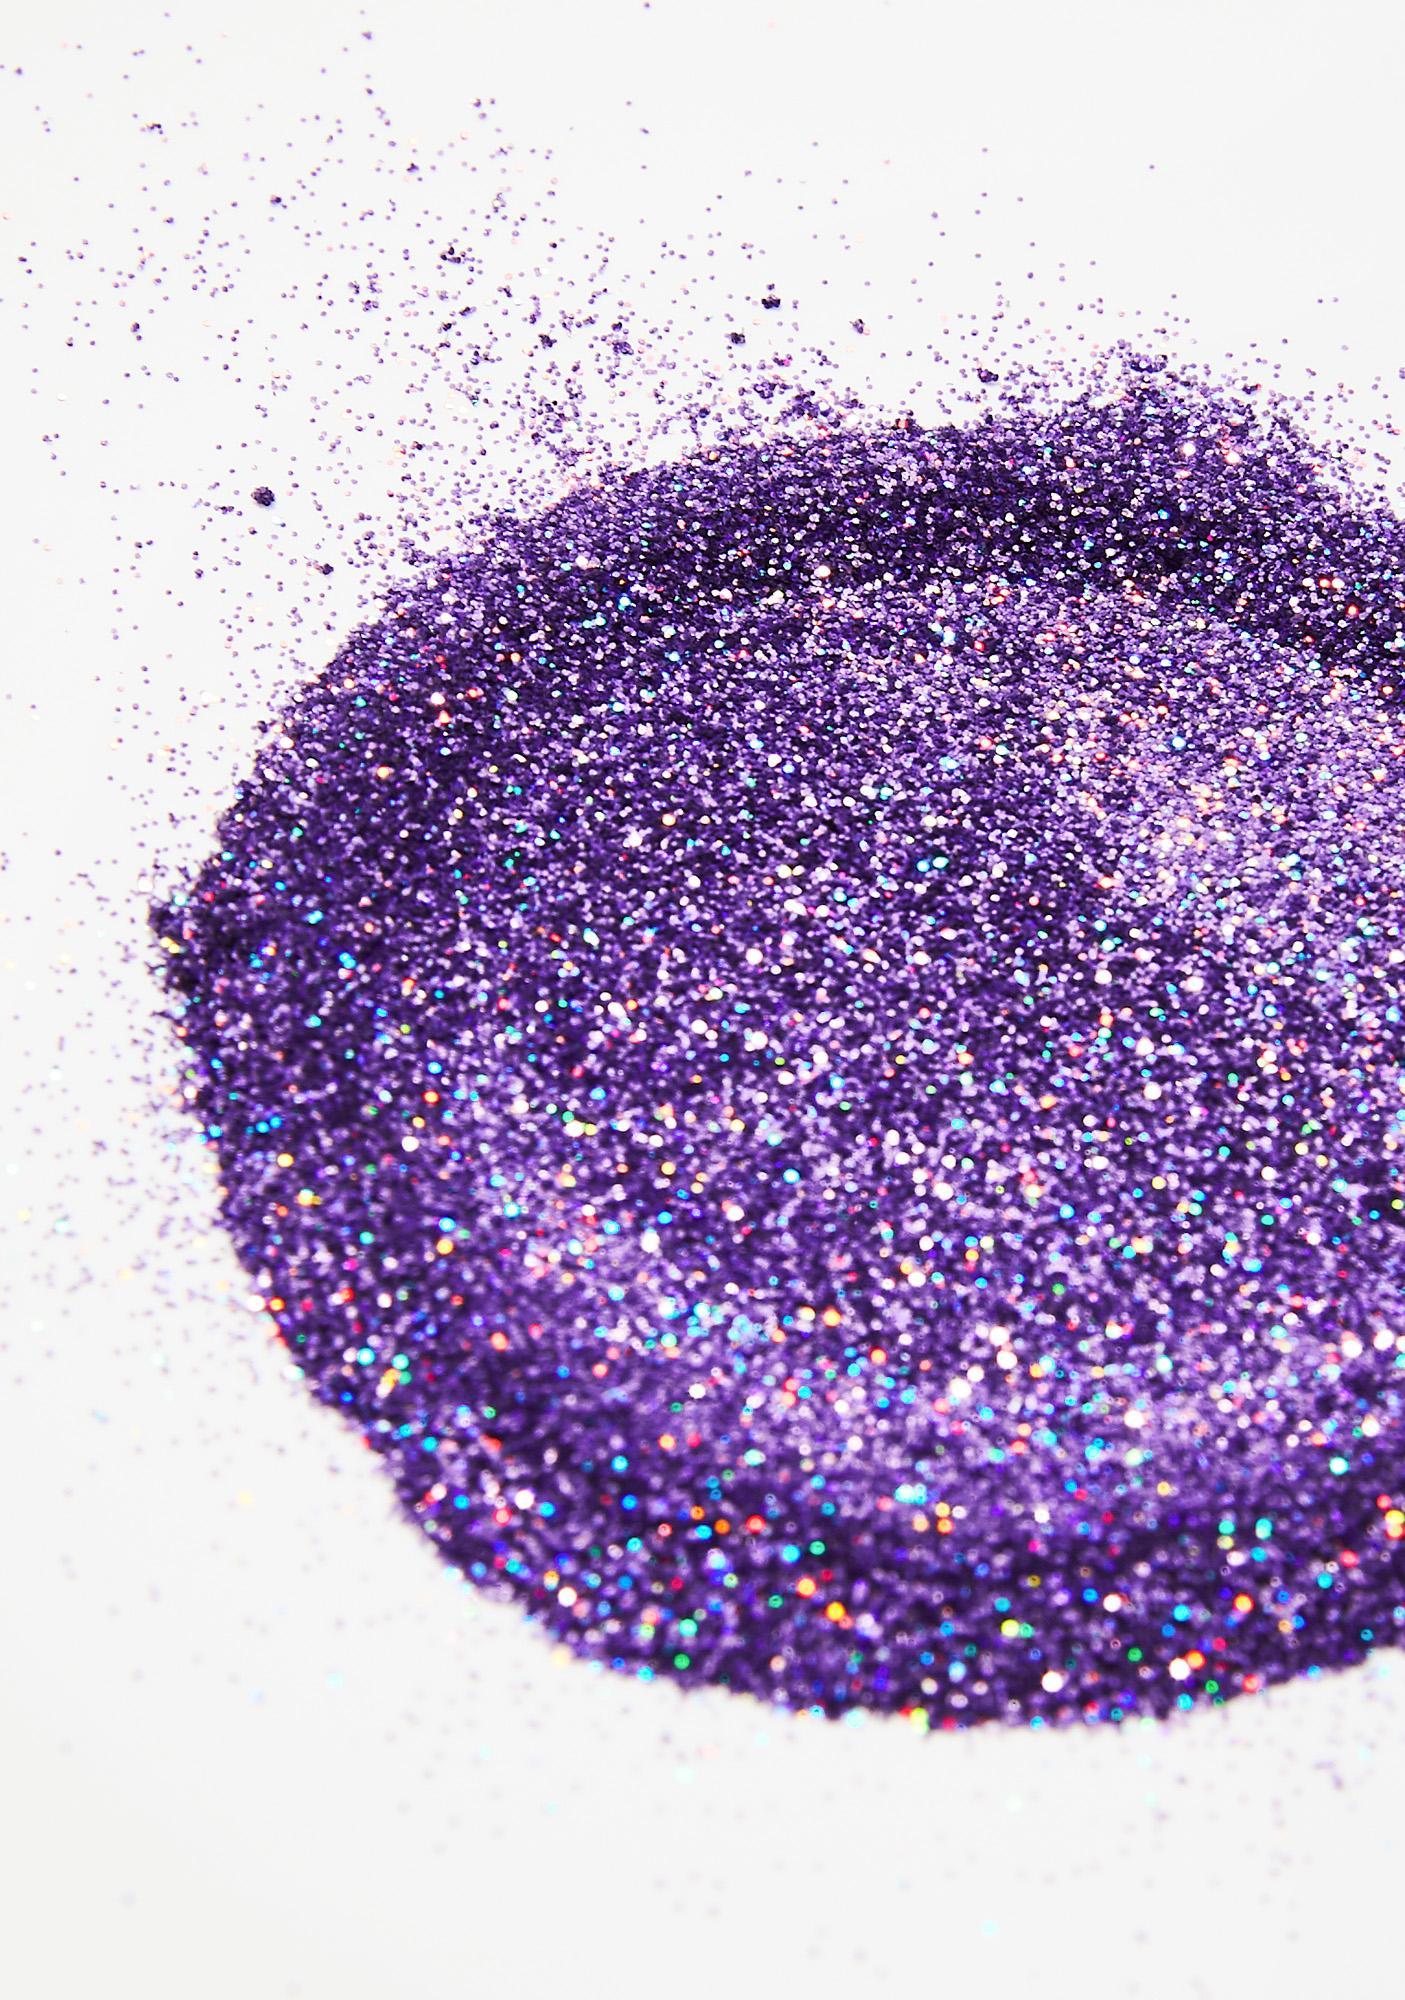 Smolder Cosmetics Stellar Radiant Loose Glitters